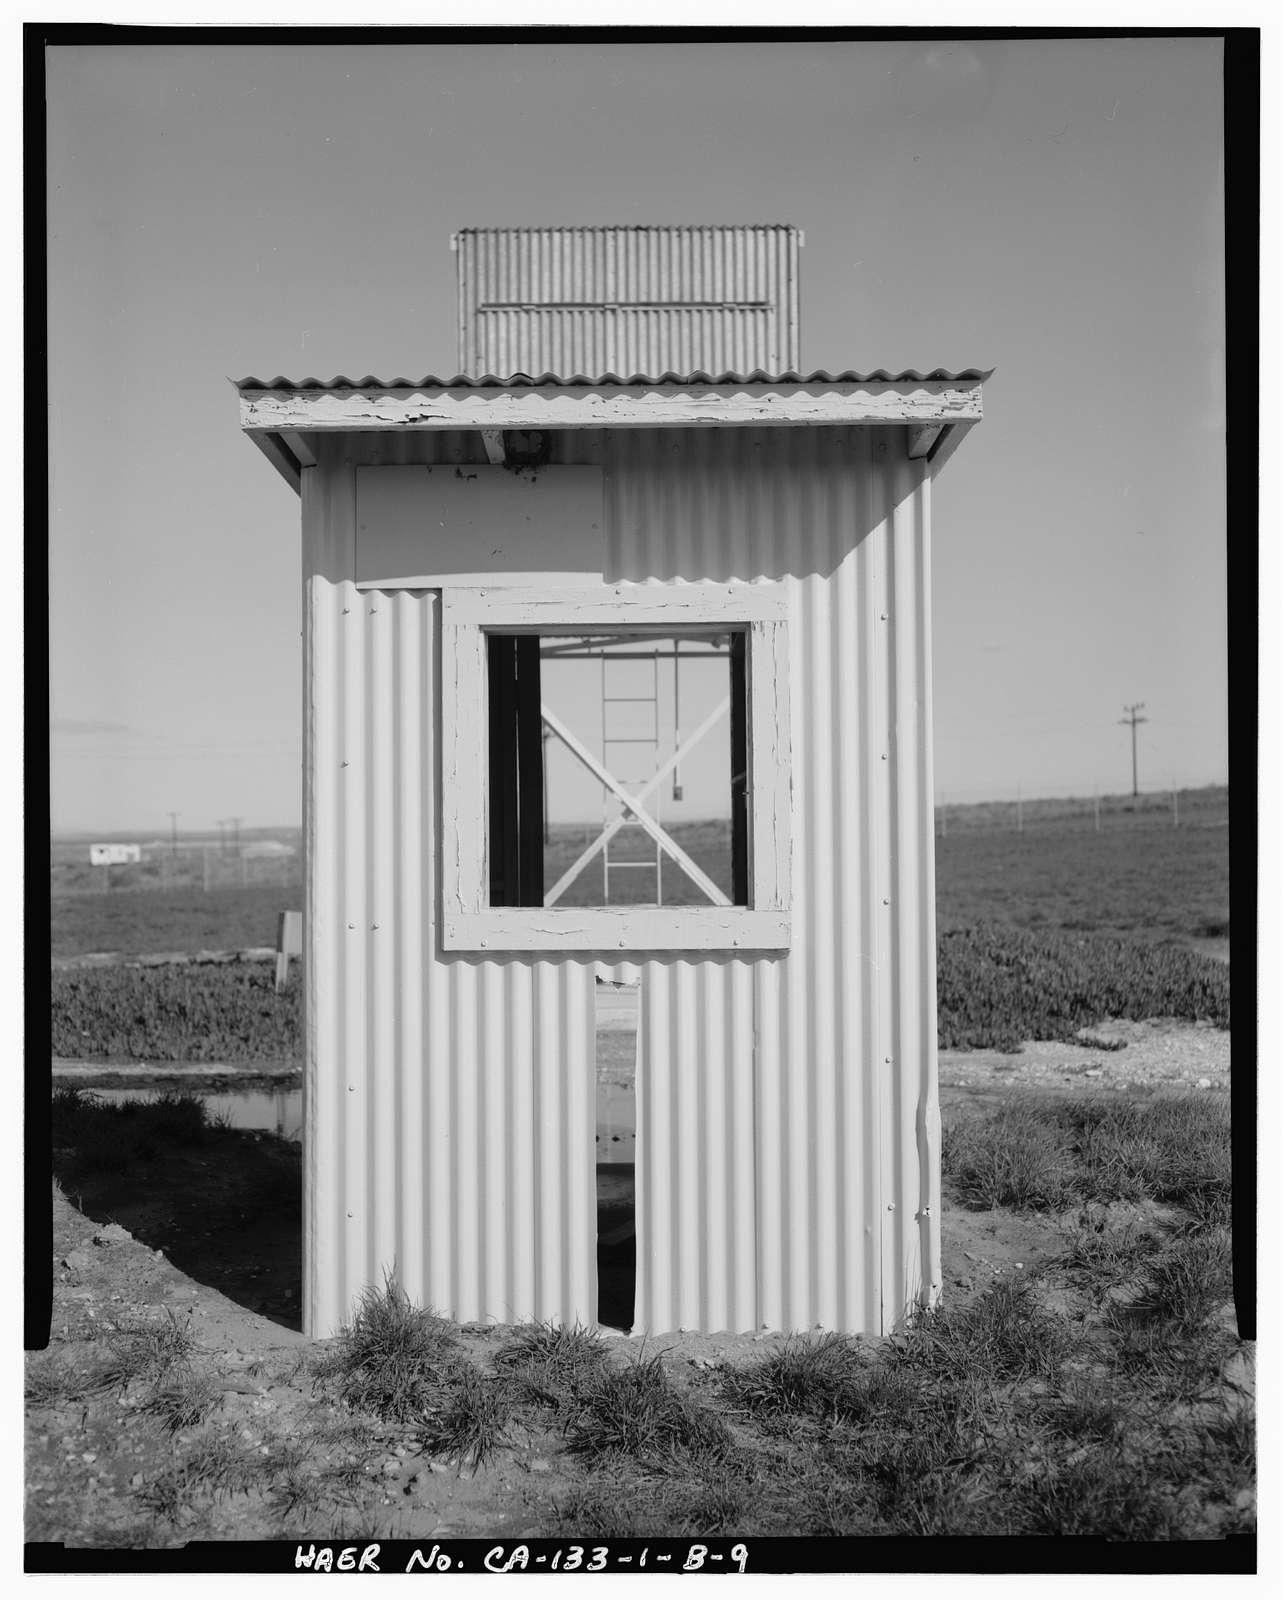 Vandenberg Air Force Base, Space Launch Complex 3, Launch Pad 3 East, Napa & Alden Roads, Lompoc, Santa Barbara County, CA